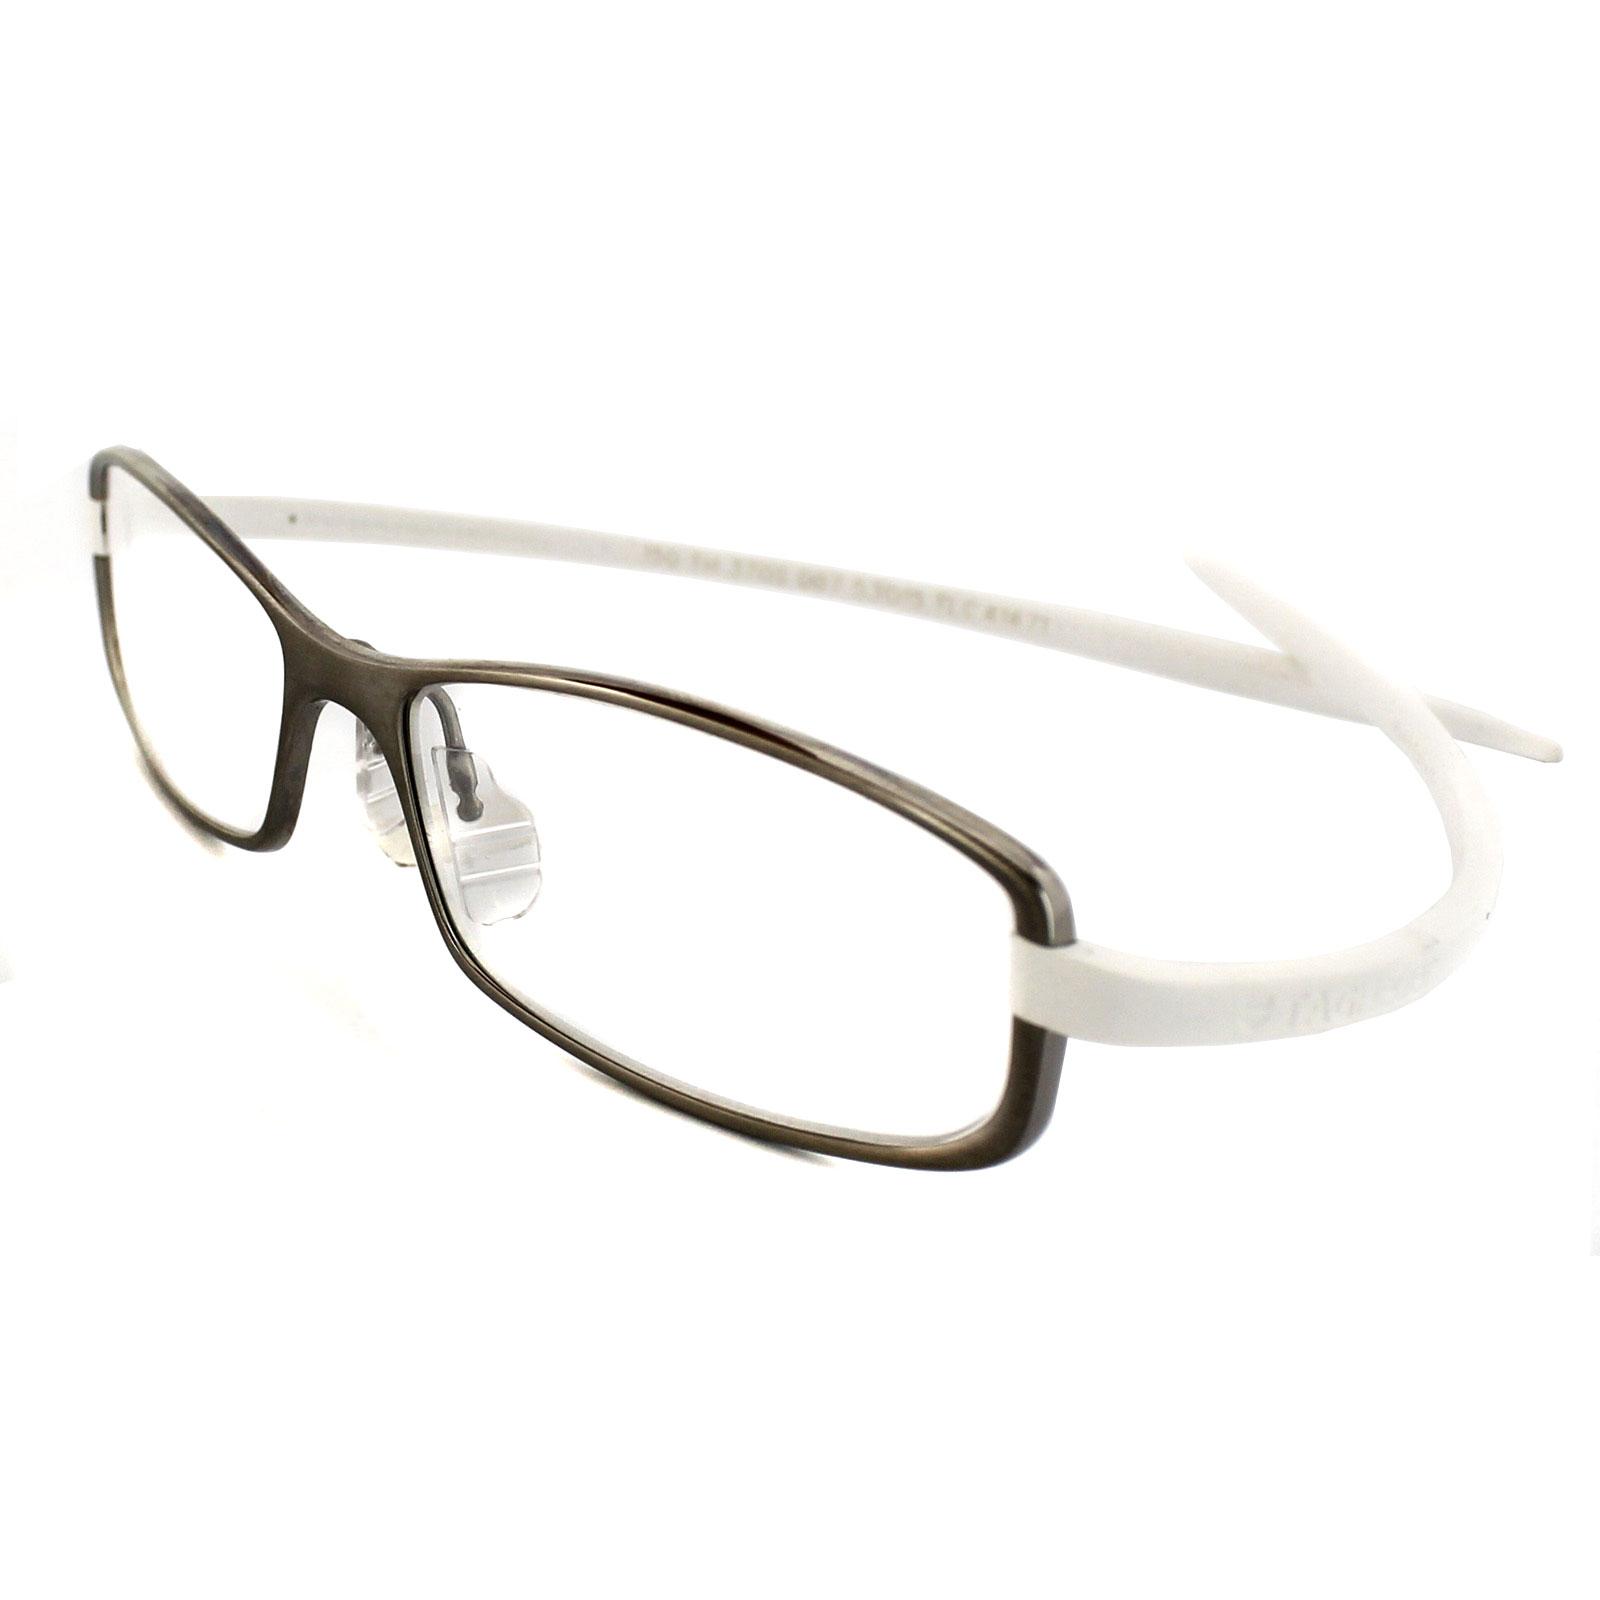 Tag heuer eyeglasses frames uk - Sentinel Tag Heuer Glasses 3705 007 Ceramic Titanium Frames White Rubber Arms